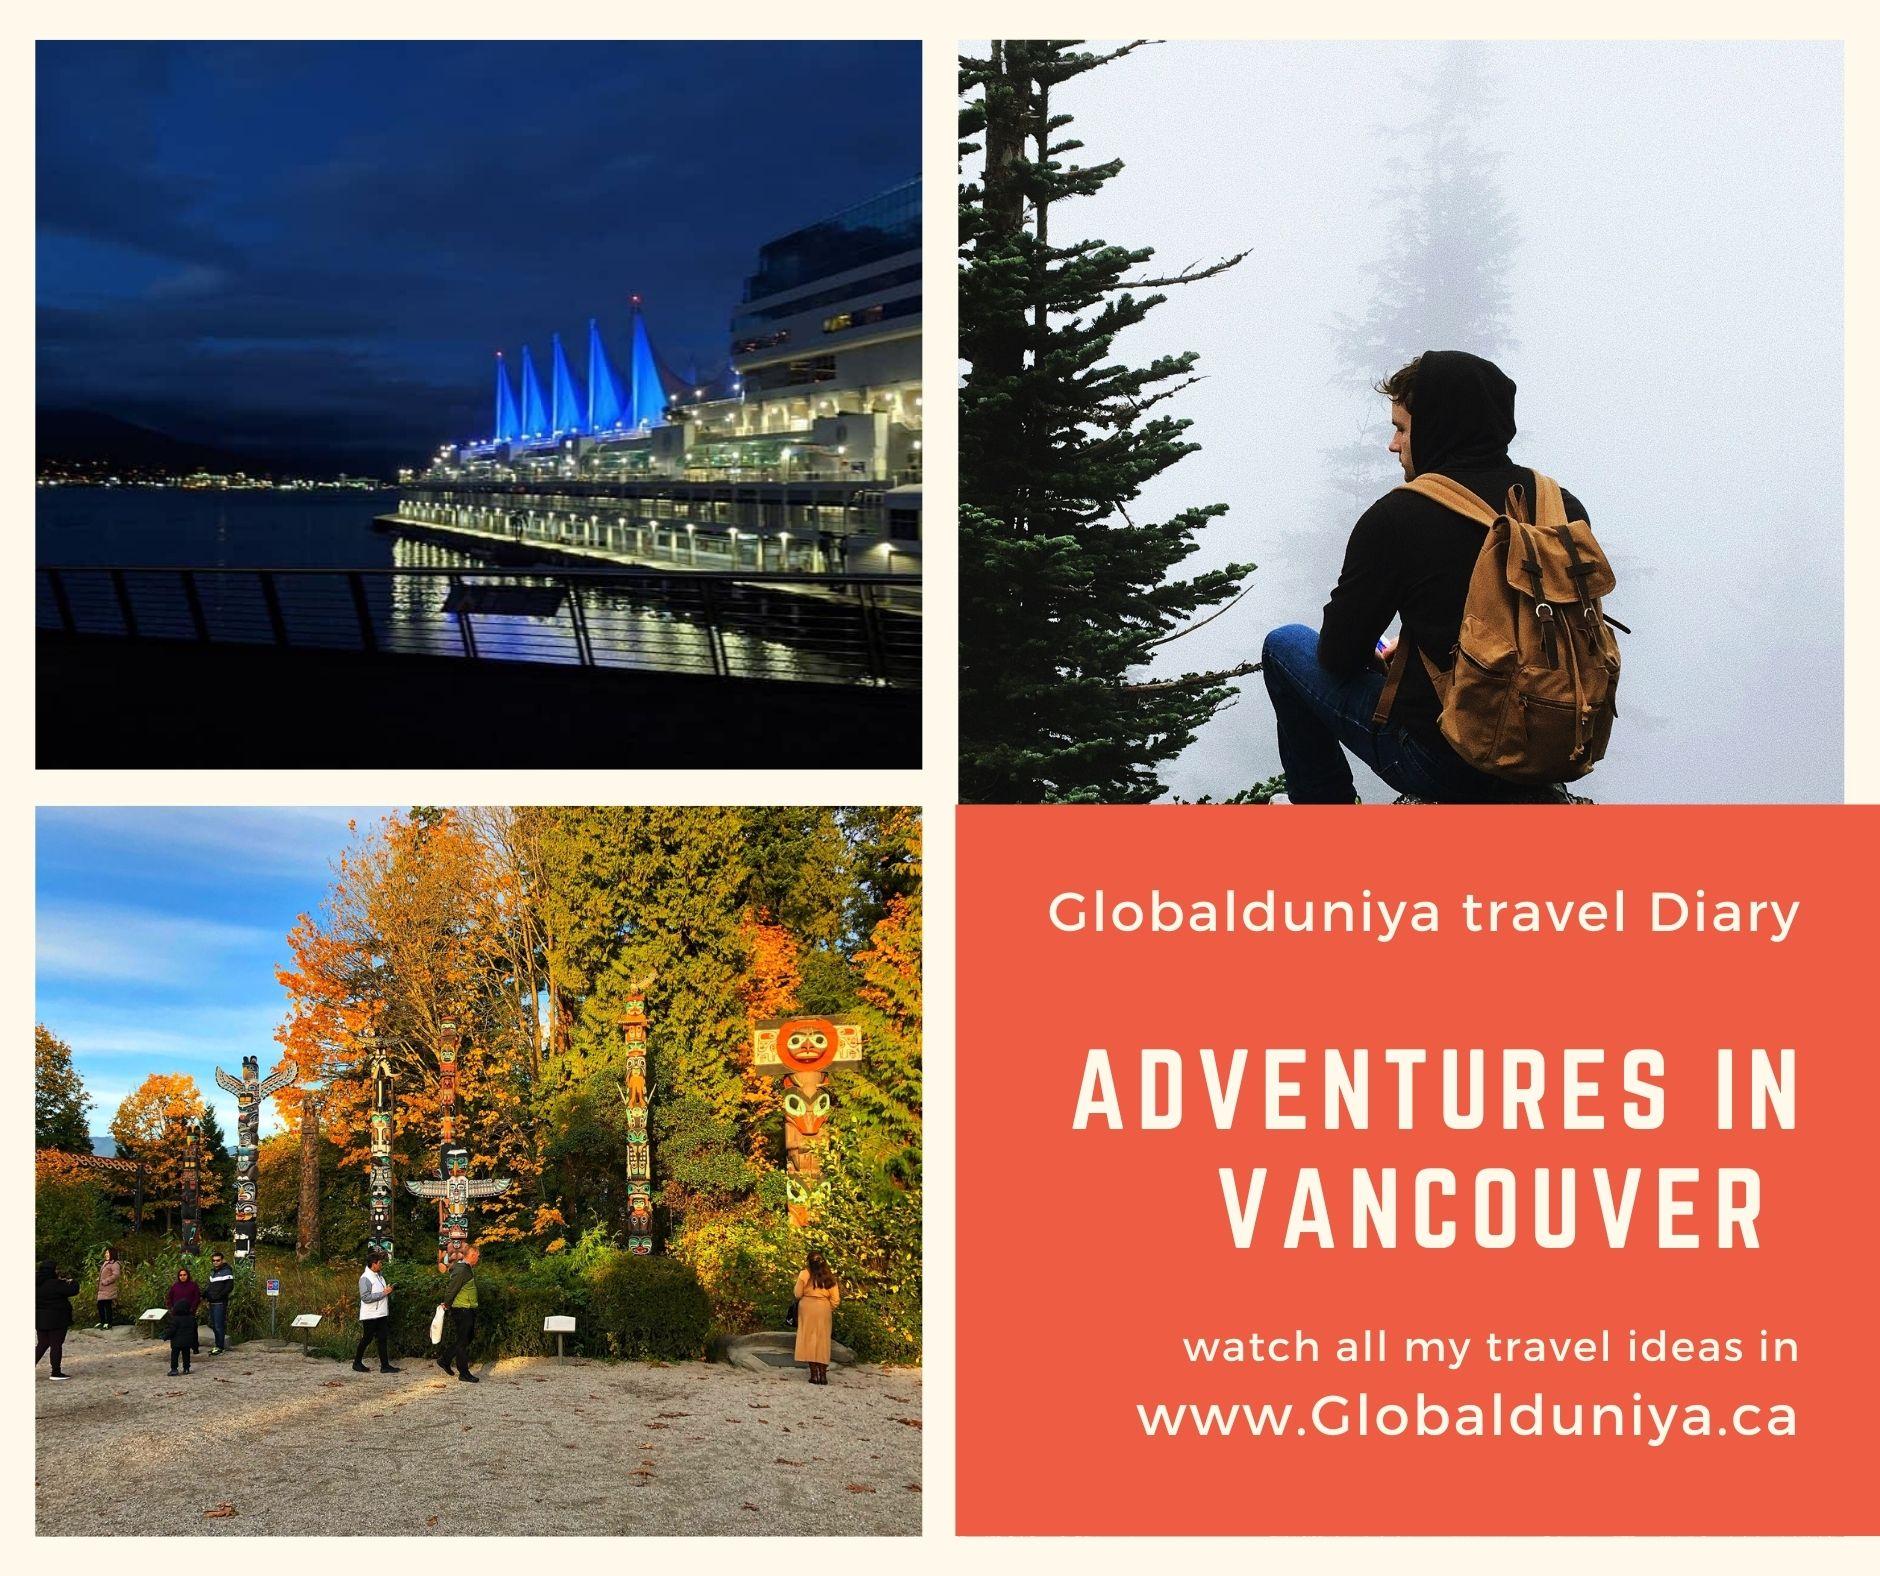 Adventure in Vancouver